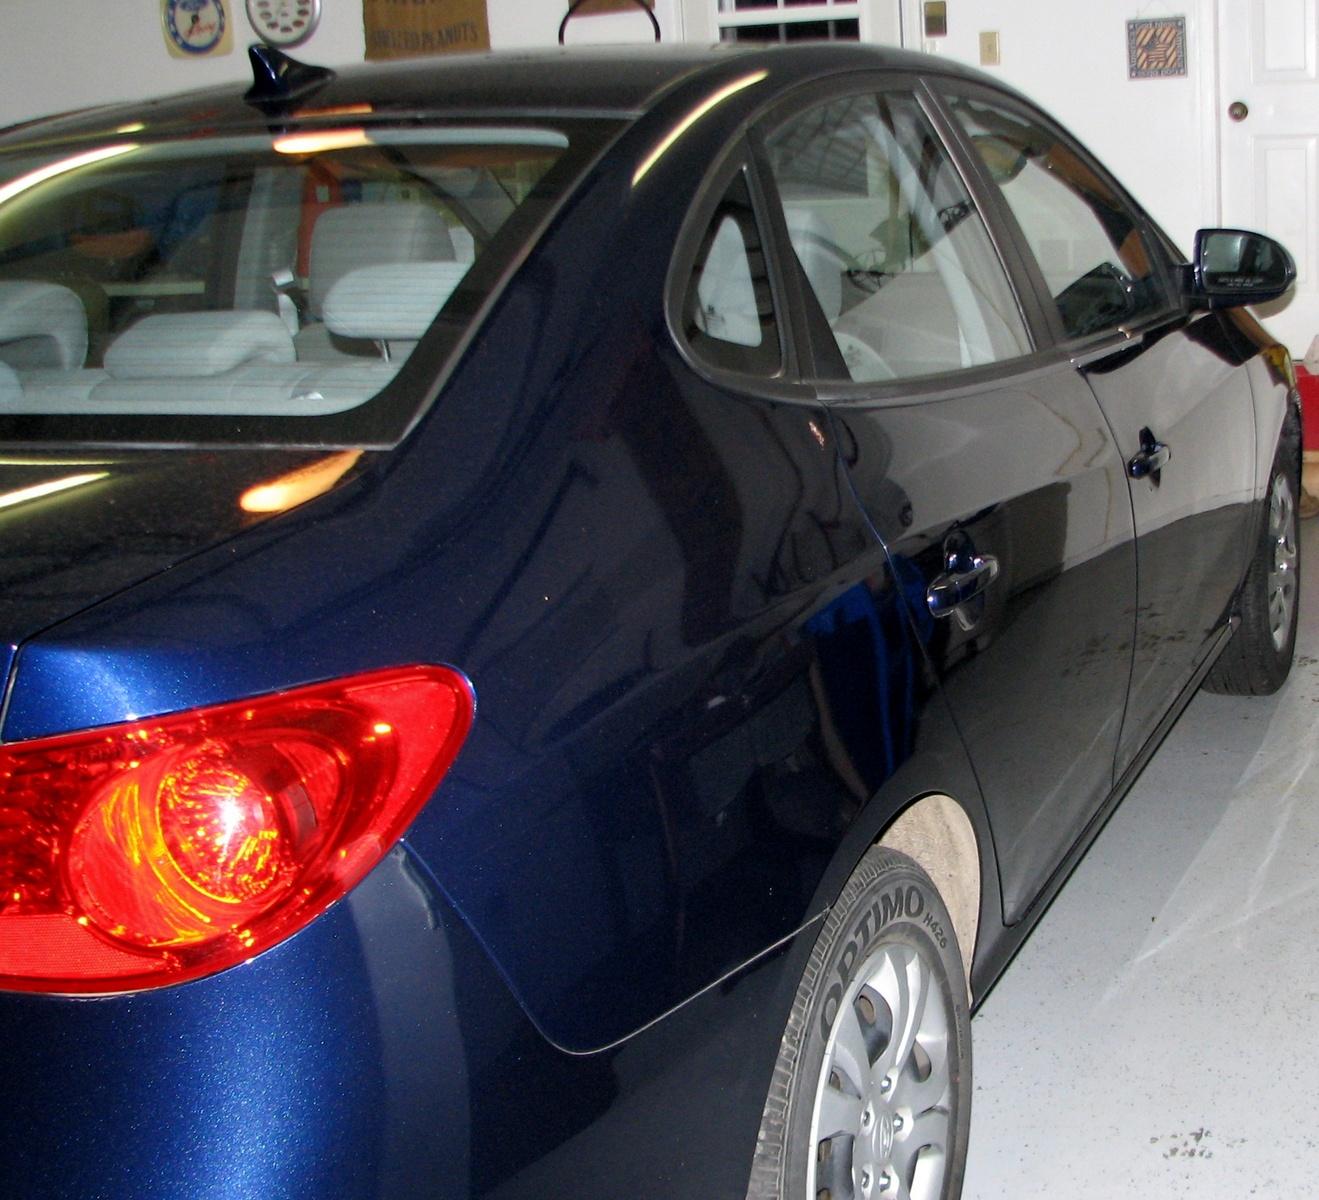 2012 Hyundai Equus Interior: 2010 Hyundai Elantra